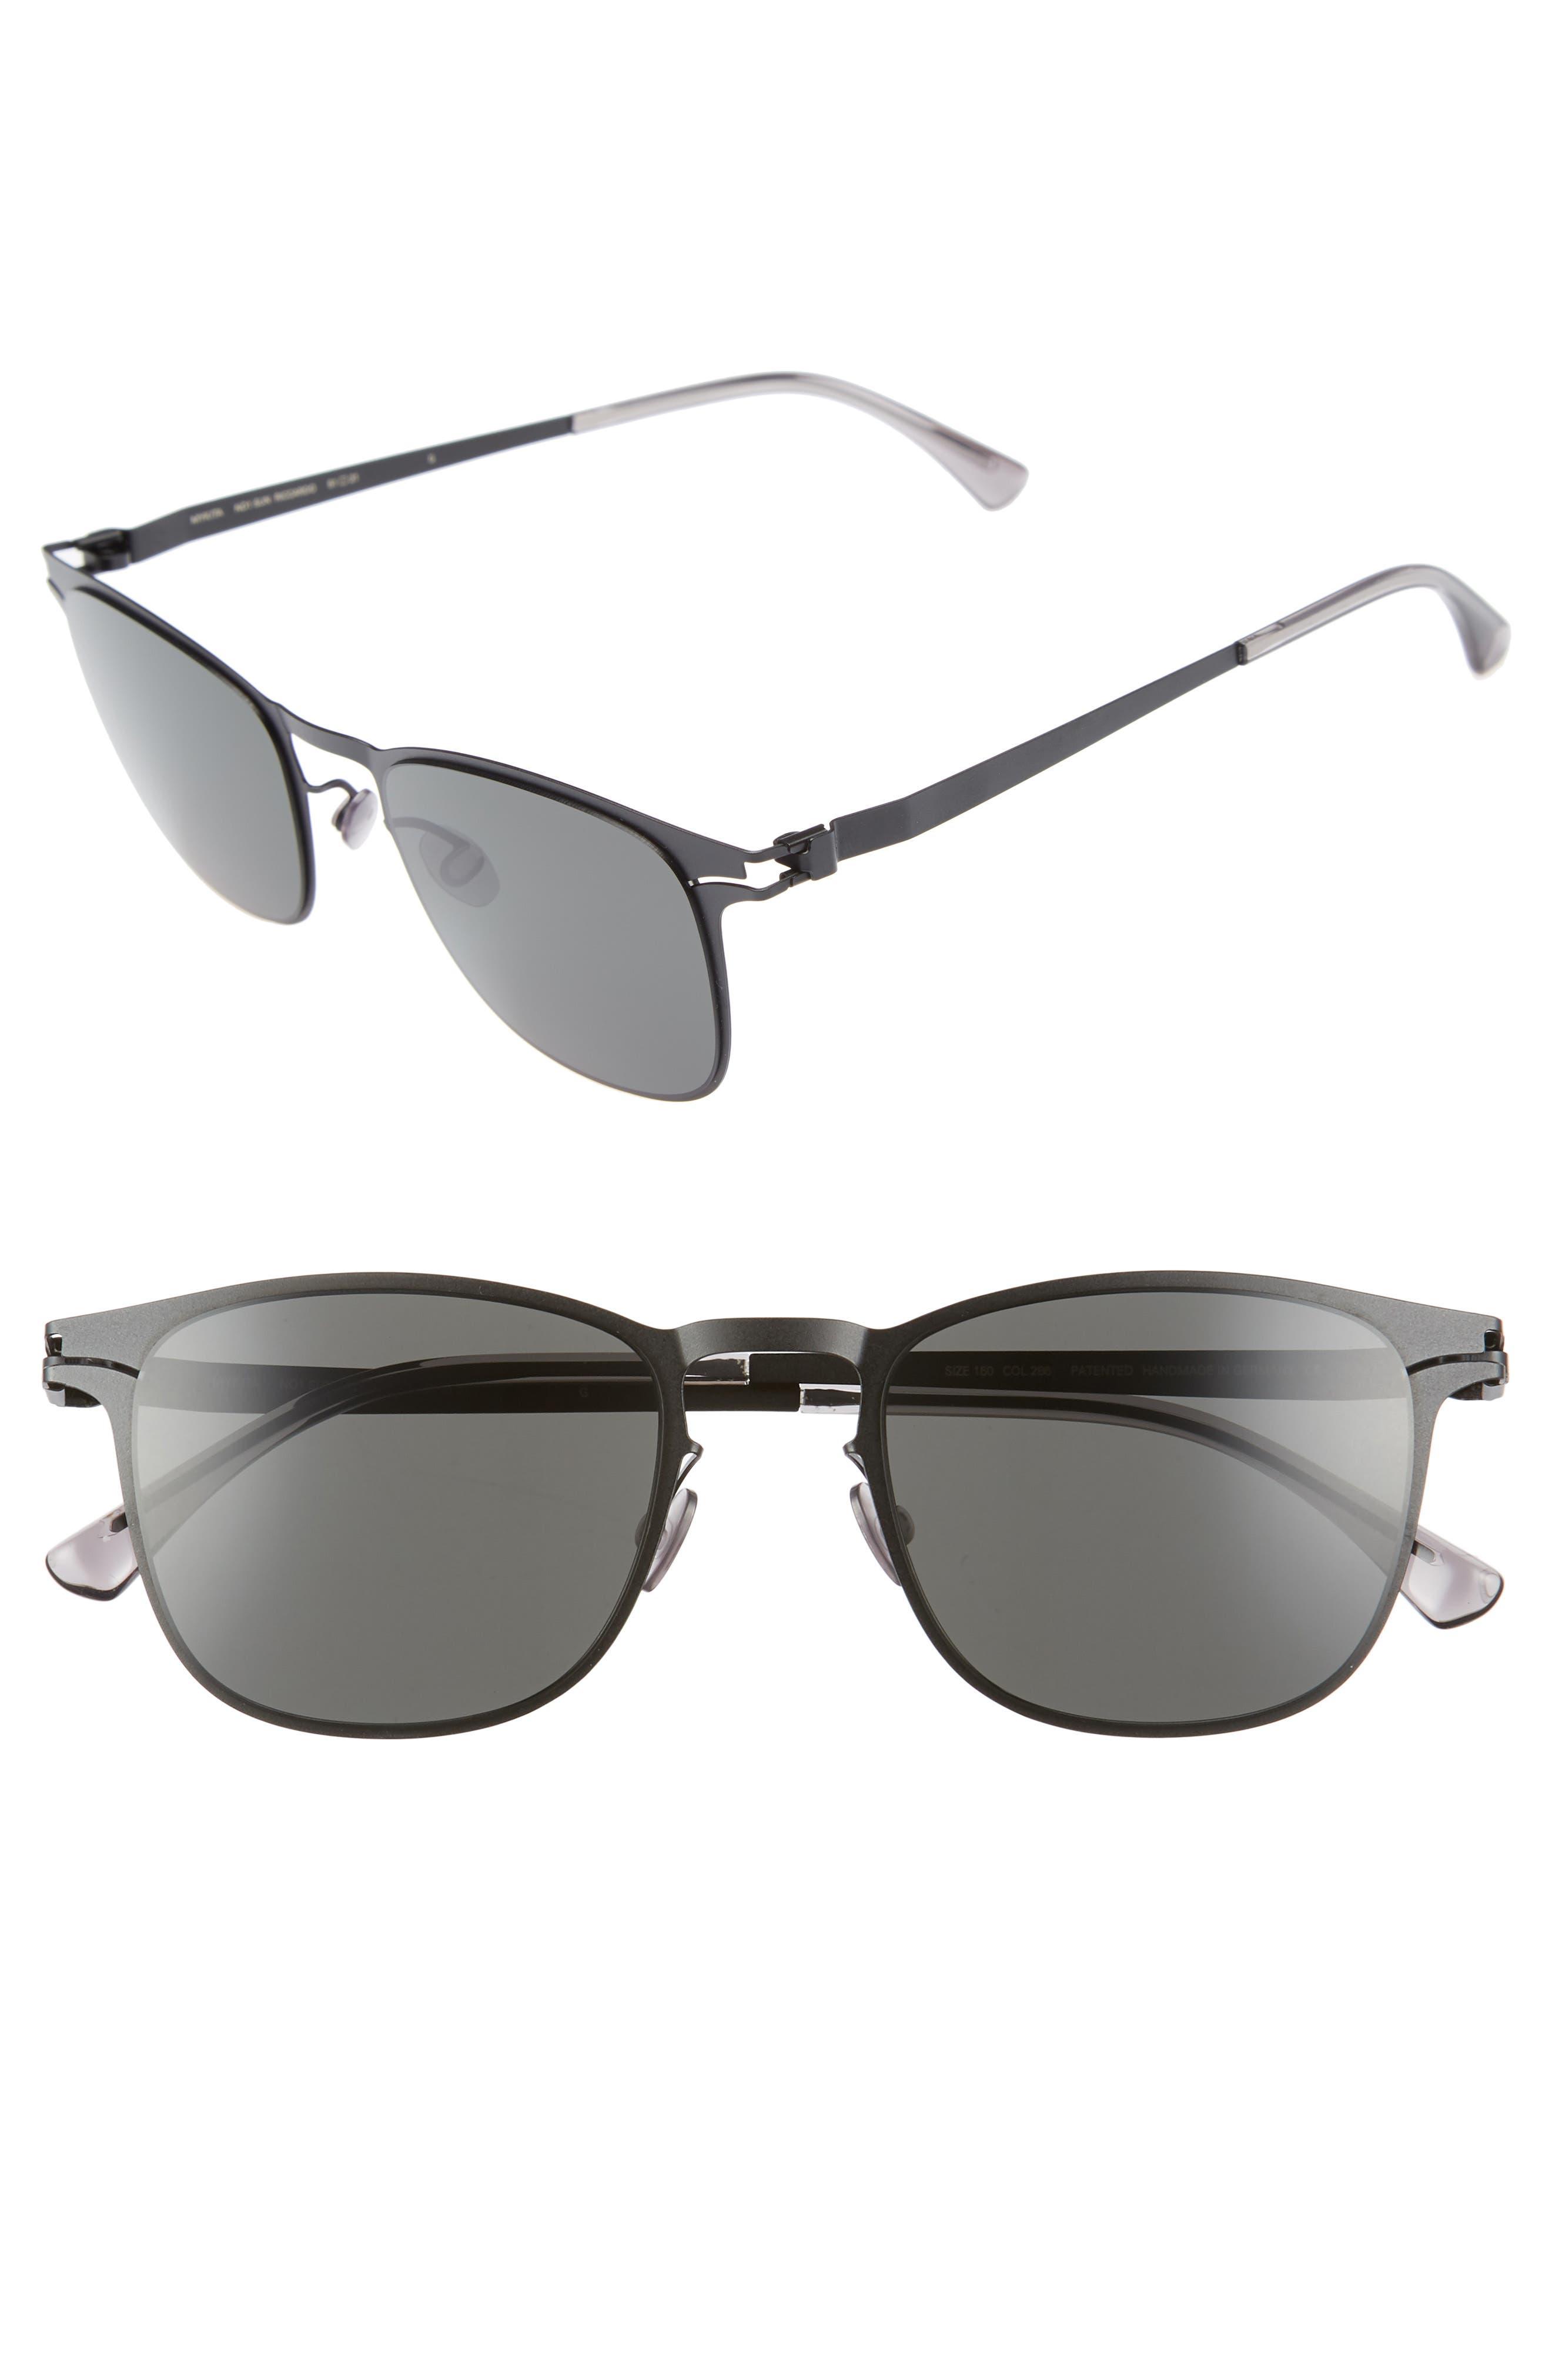 Riccardo 51mm Sunglasses,                         Main,                         color, Matte Black